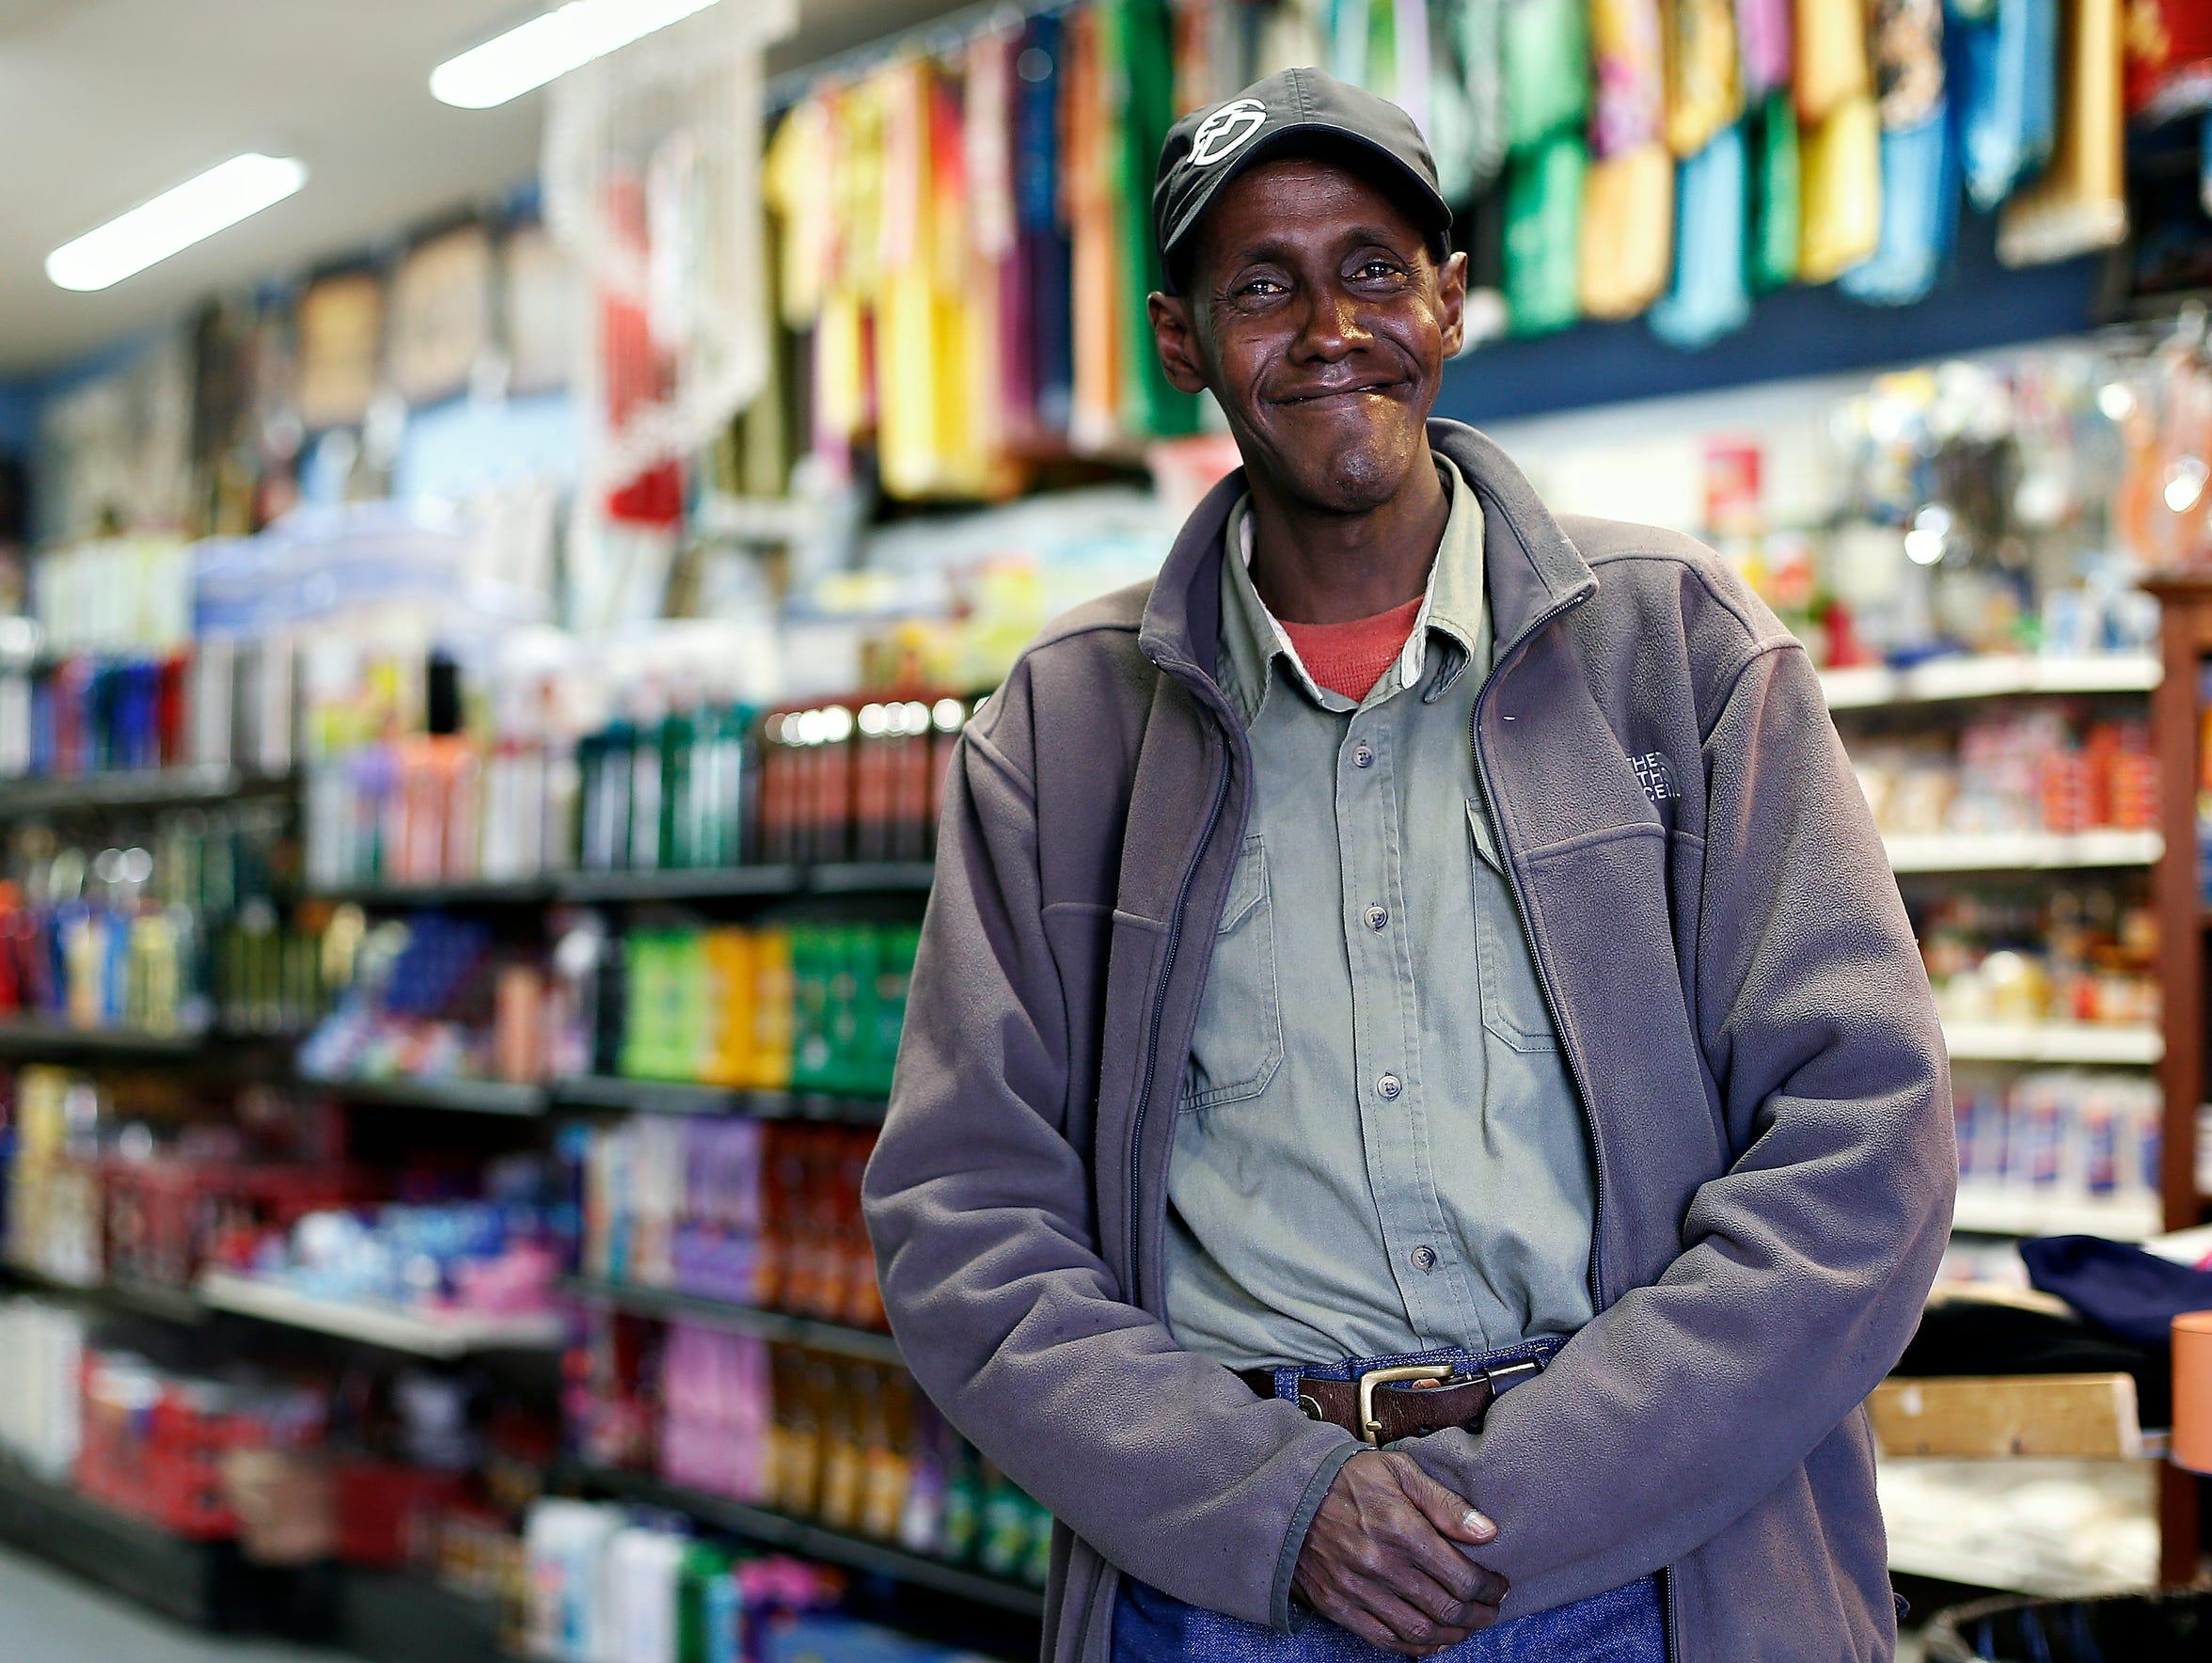 Abdul Kadir Abdullahi mingled in downtown Noel's African